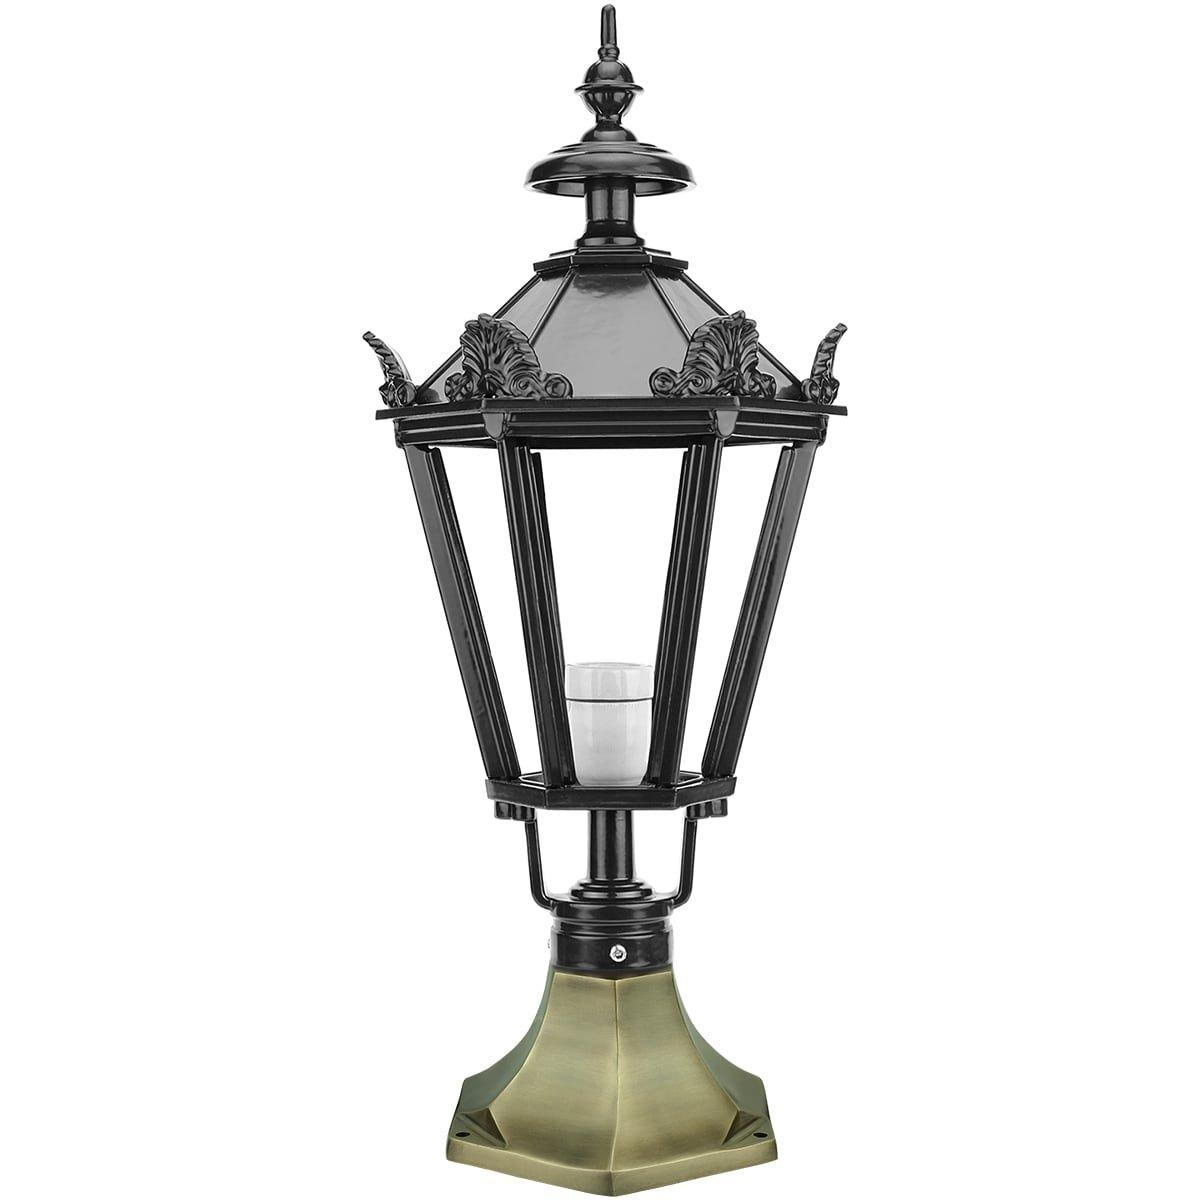 Outdoor Lighting Classic Nostalgic Outdoor Lantern low Asselt broze - 64 cm